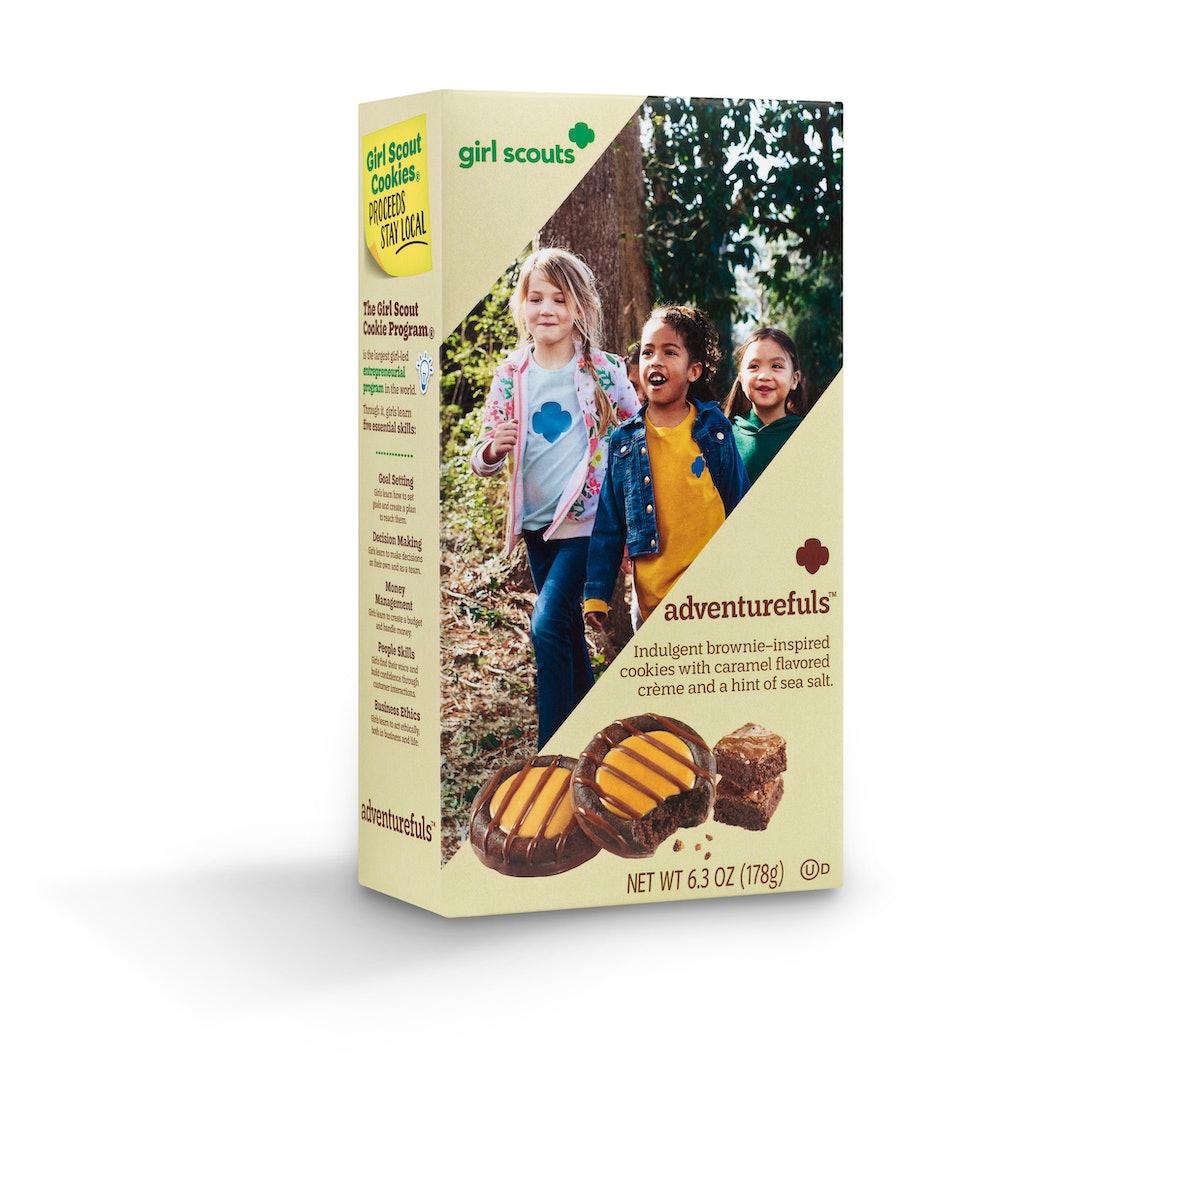 Girl Scouts' Adventurefuls cookies taste like a take on a brownie.